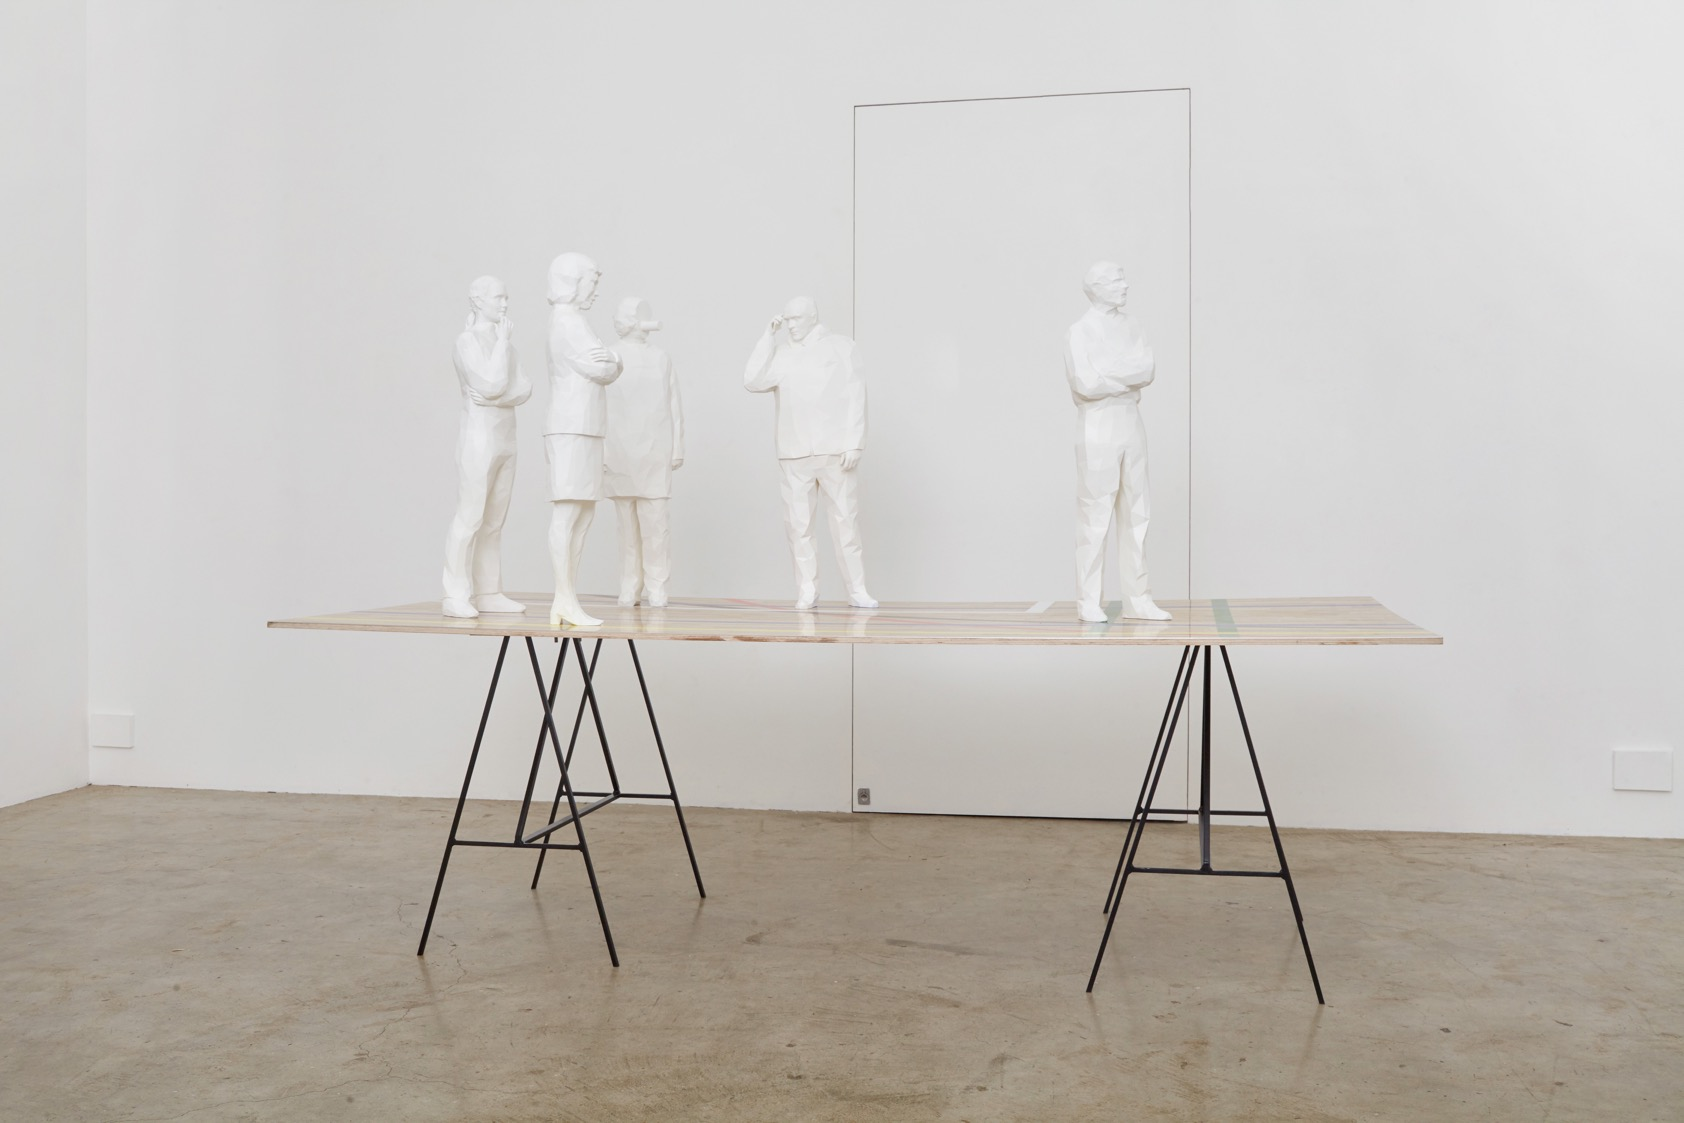 Geoff Kleem